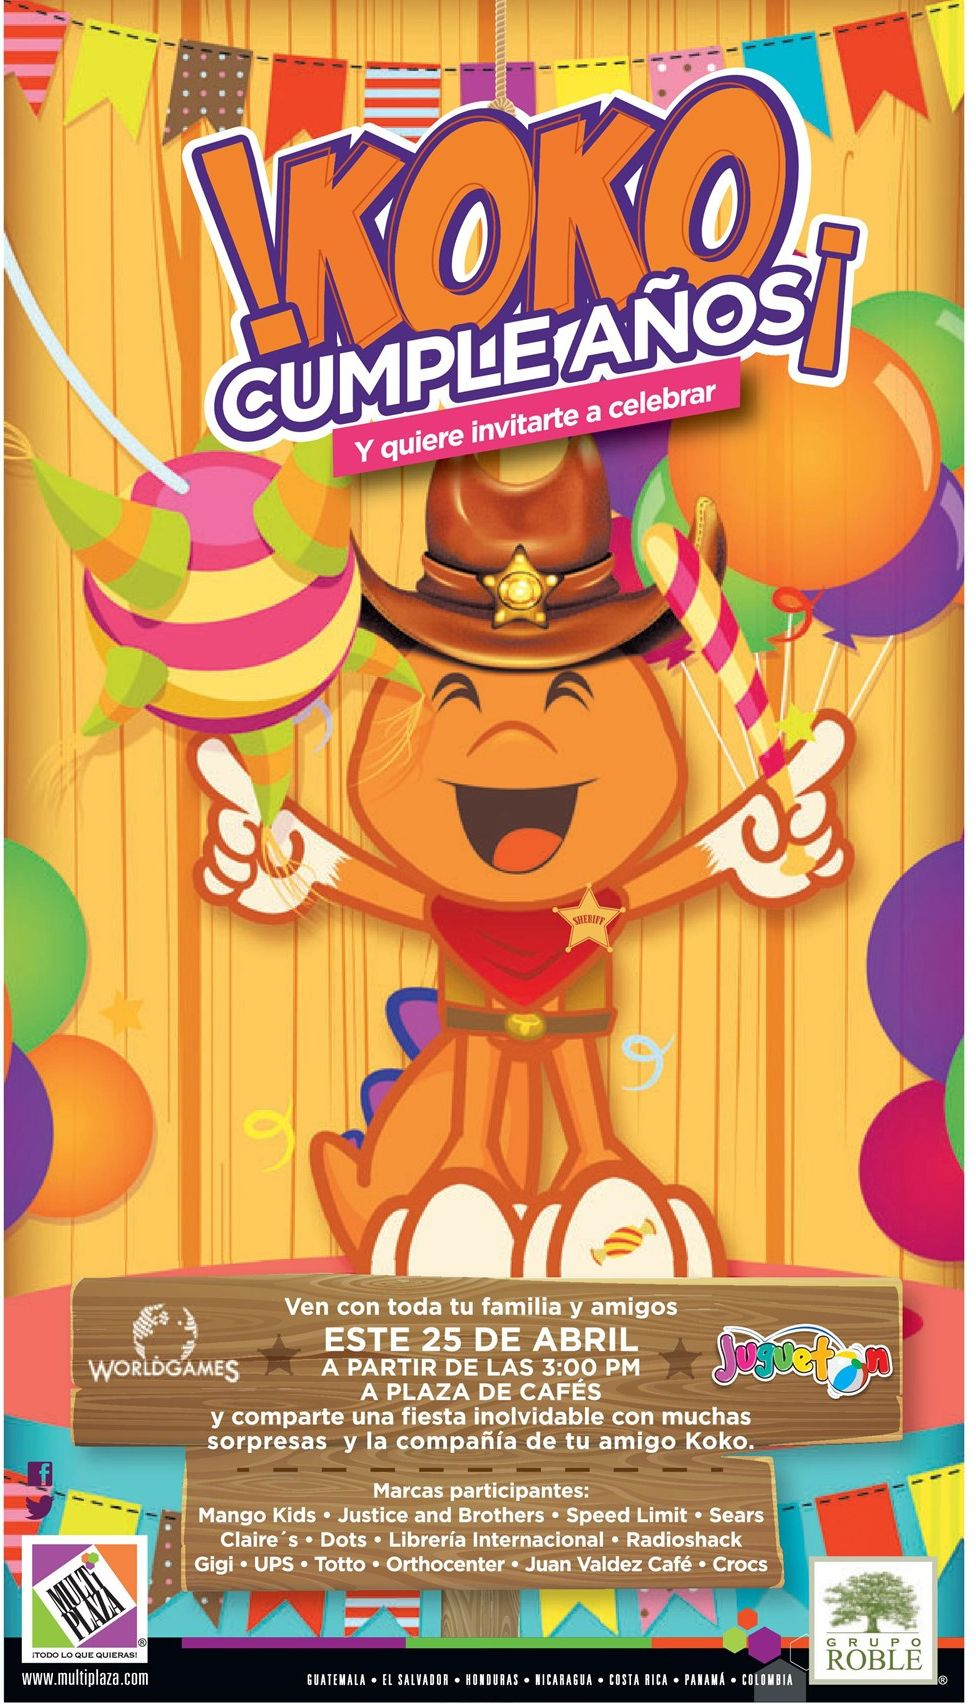 Party for KIDS on multiplaza KOKO cumple años